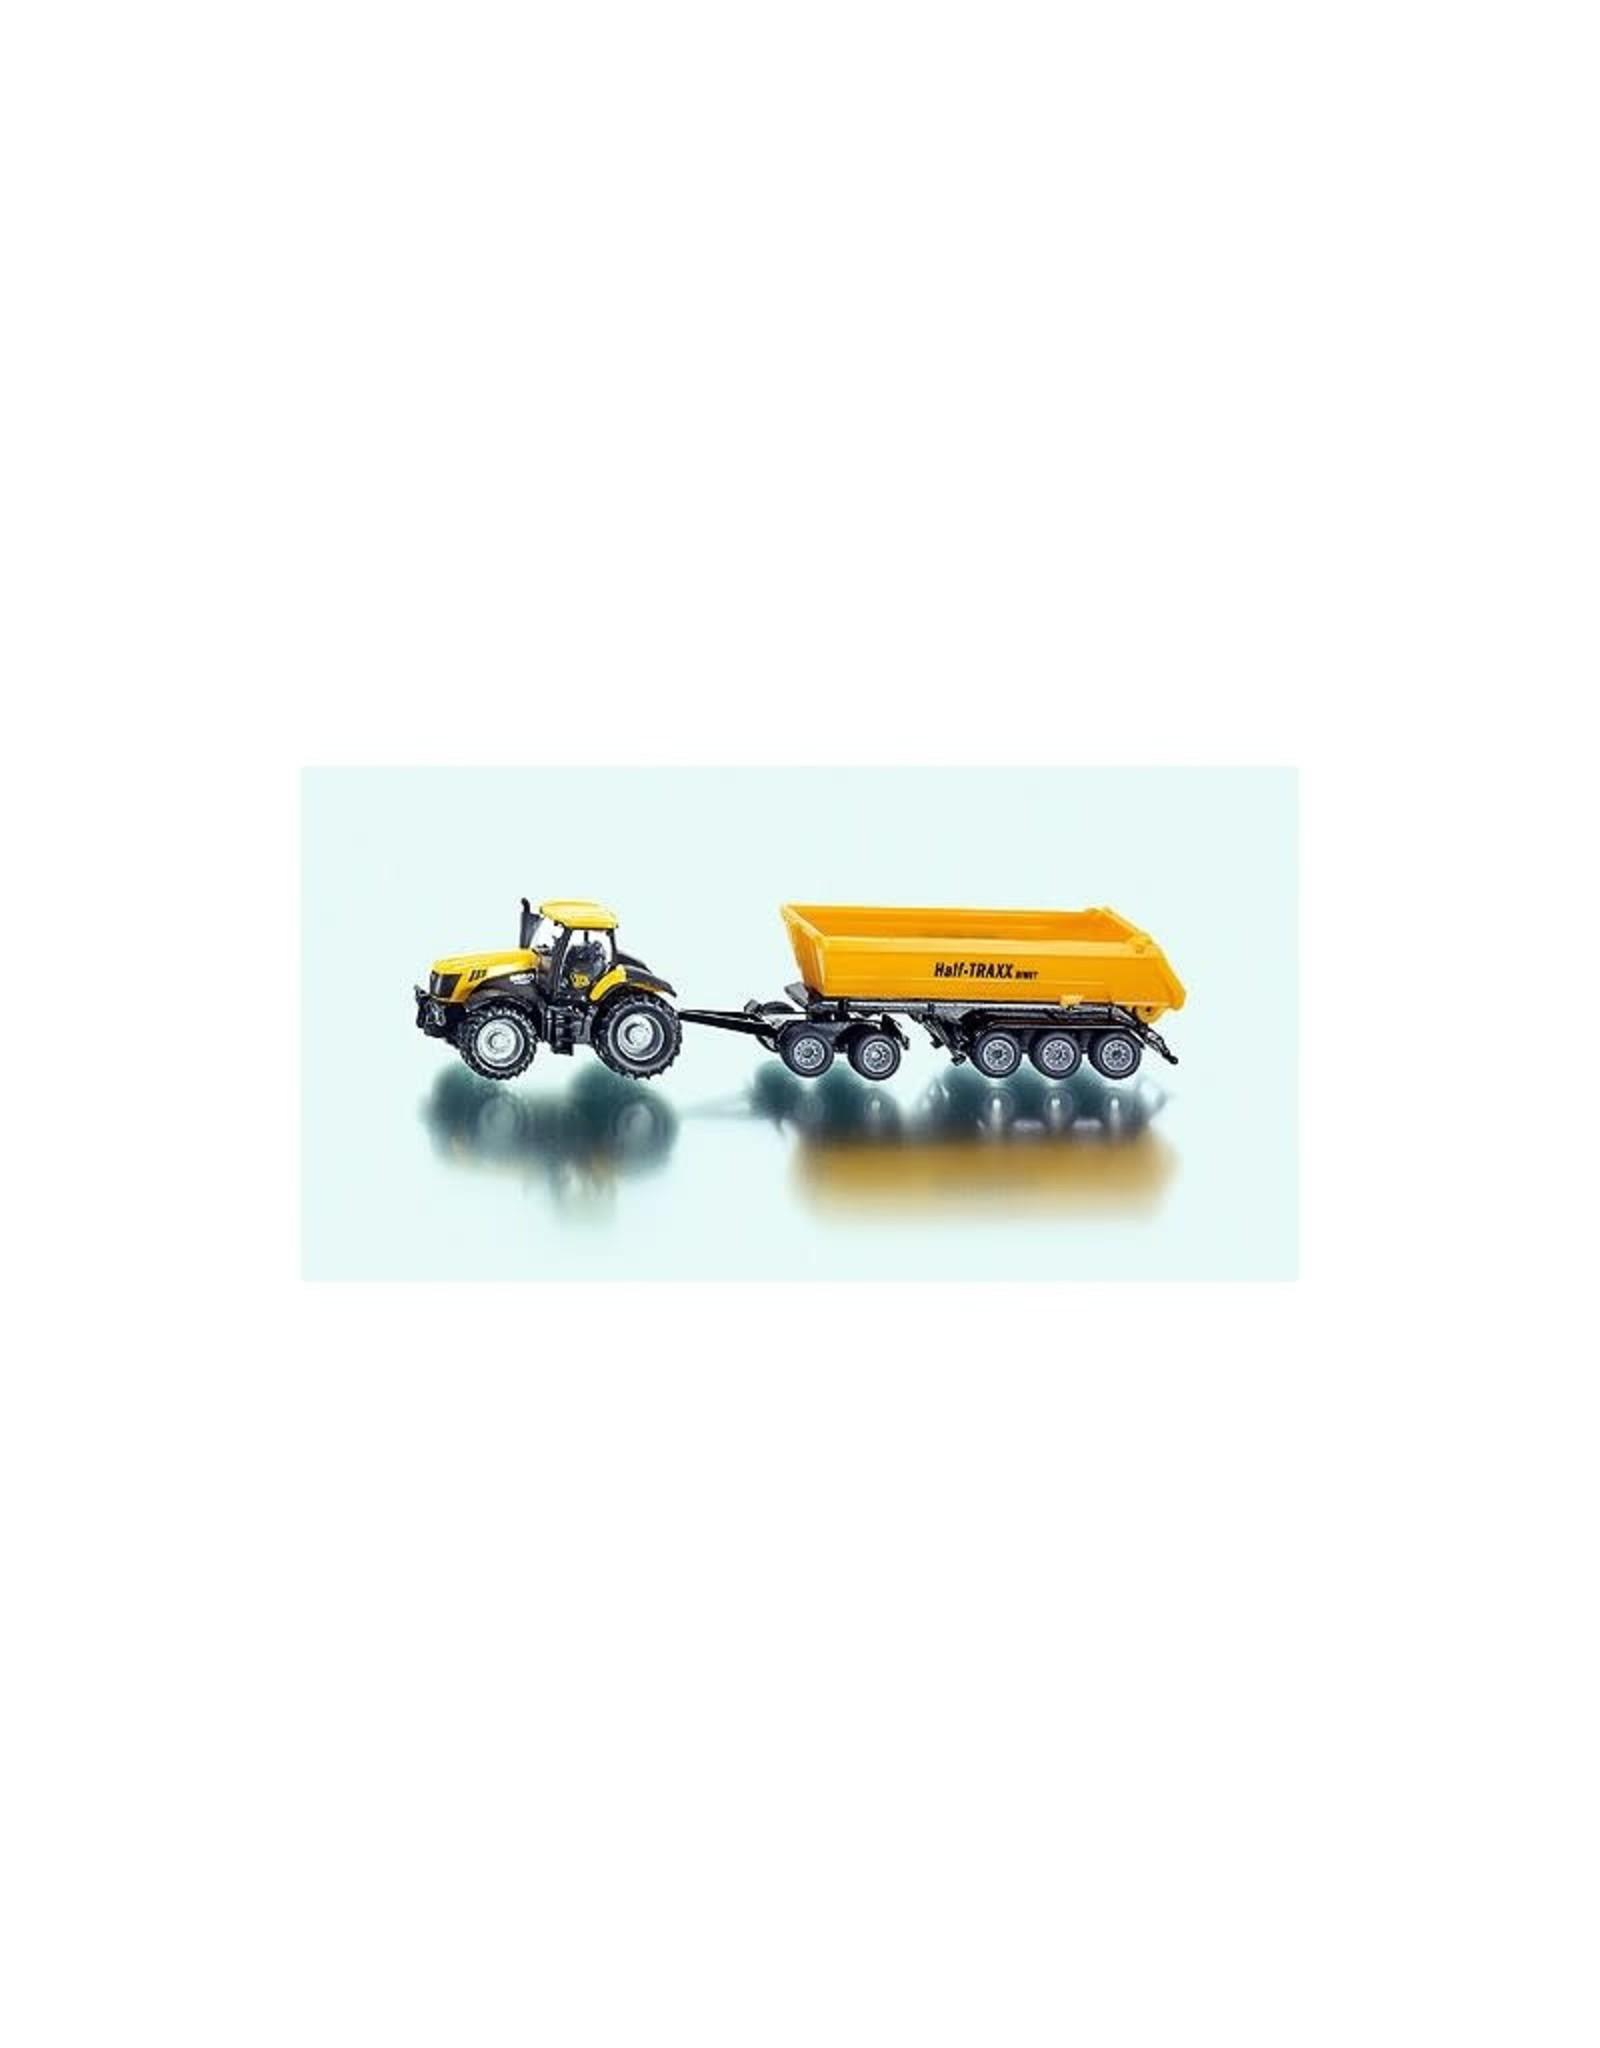 Siku Siku 1858 - 1:87 Tractor met Dolly en Kiepwagen